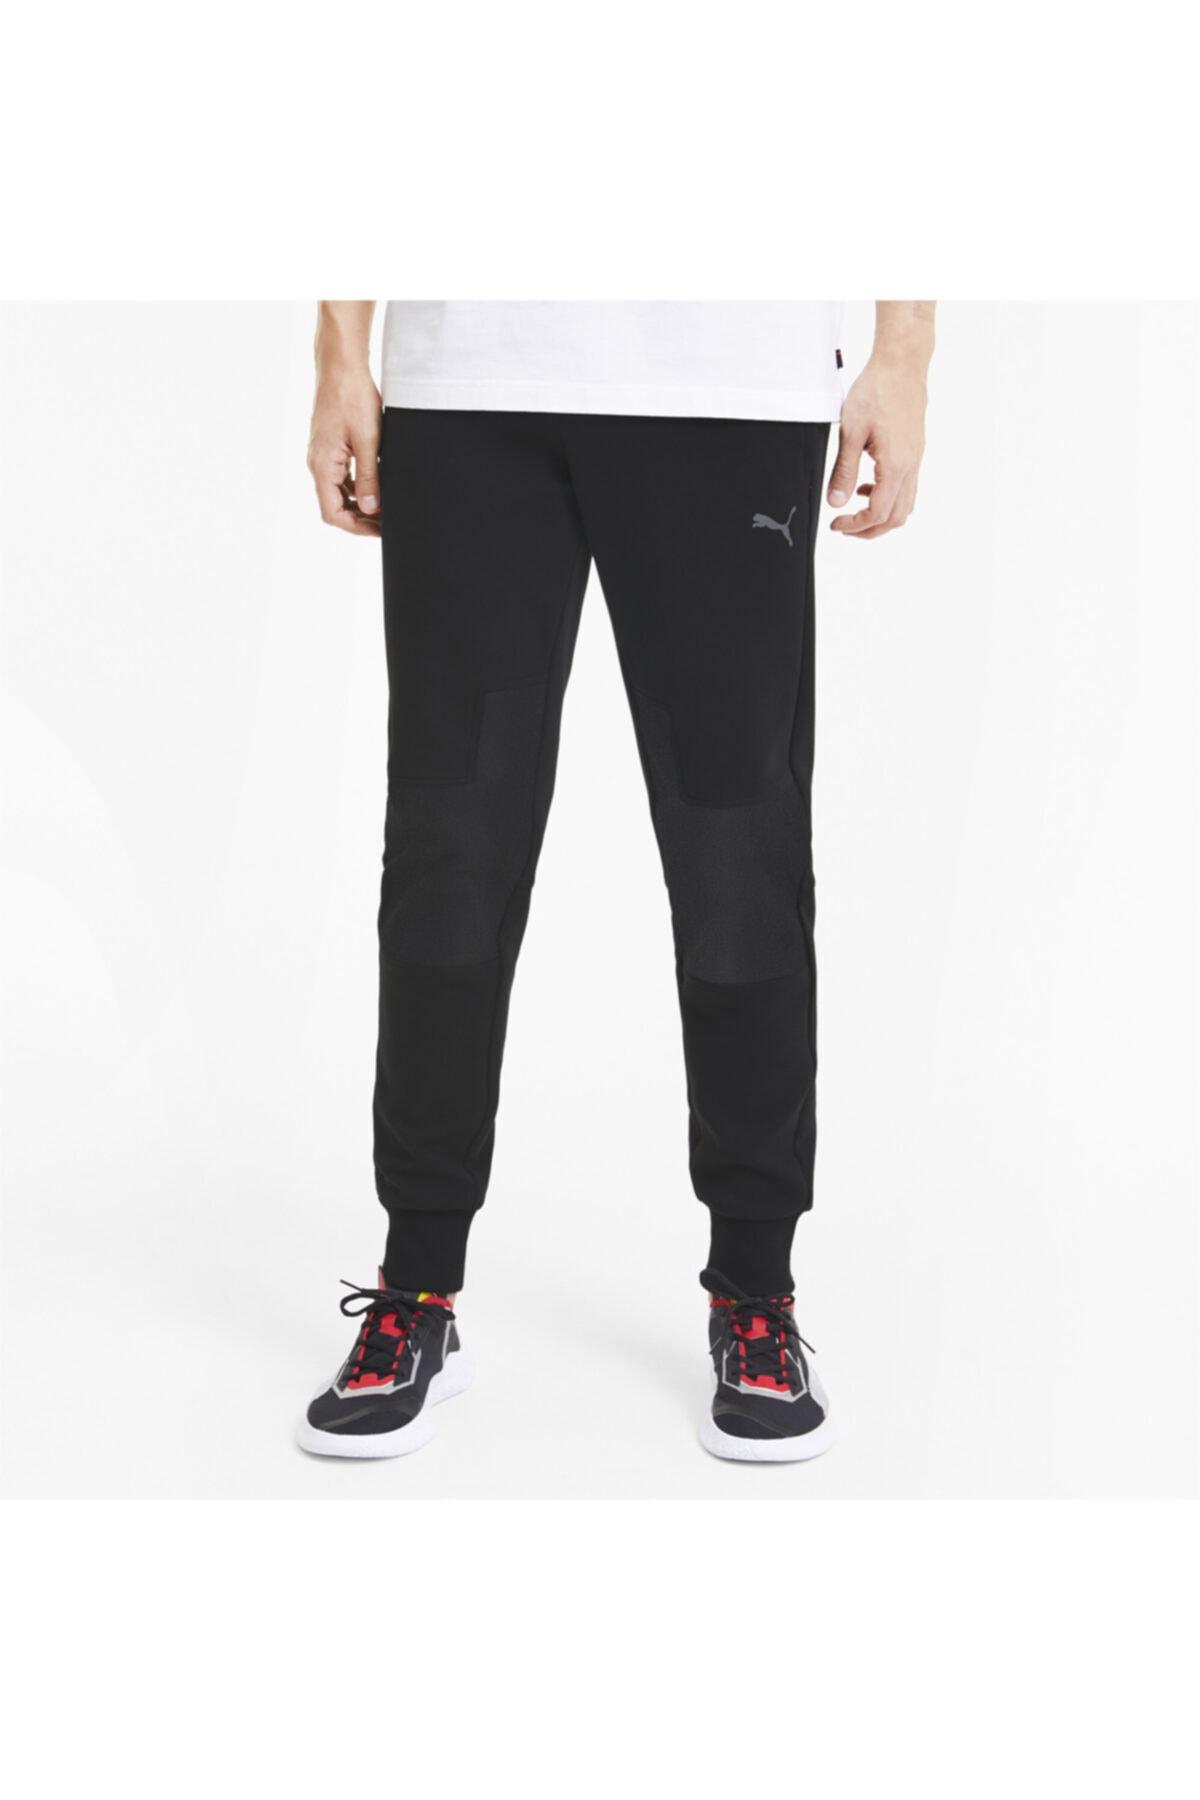 Ferrari Style Sweat Pants Cc Erkek Siyah Günlük Eşofman Altı 59792801